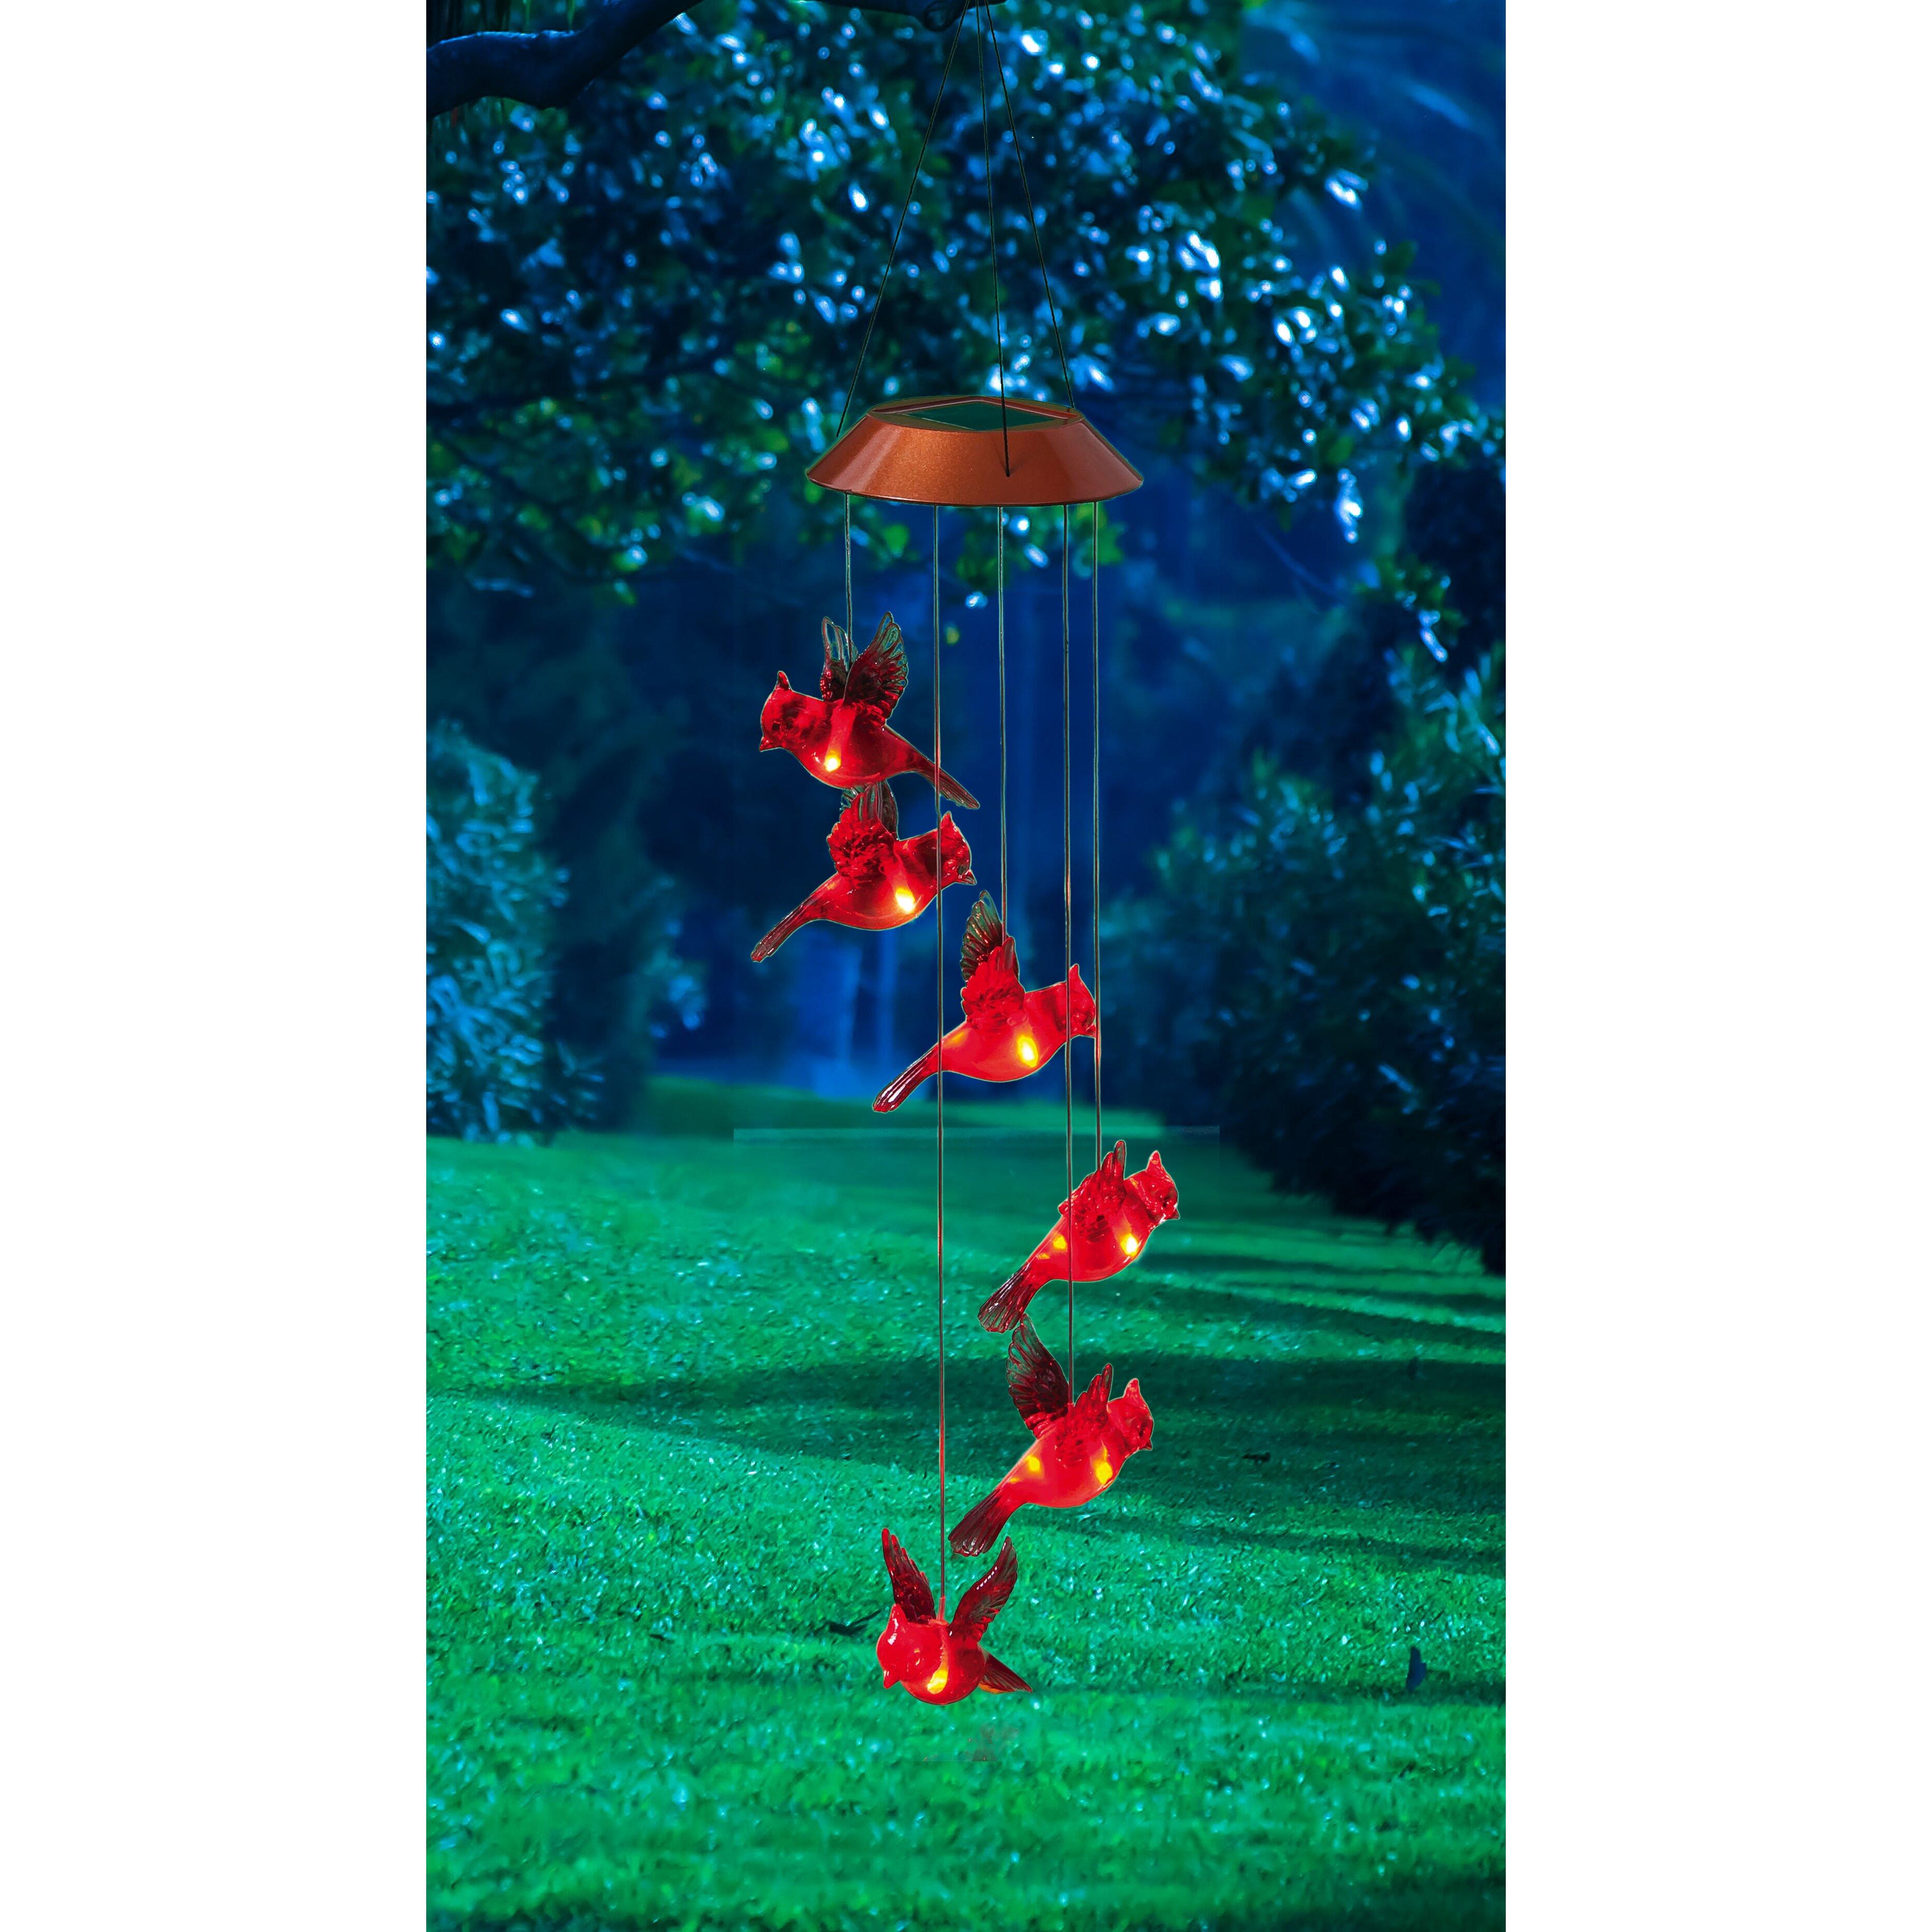 Evergreen Flag Garden Garden Days Cardinal Solar Mobile Wind